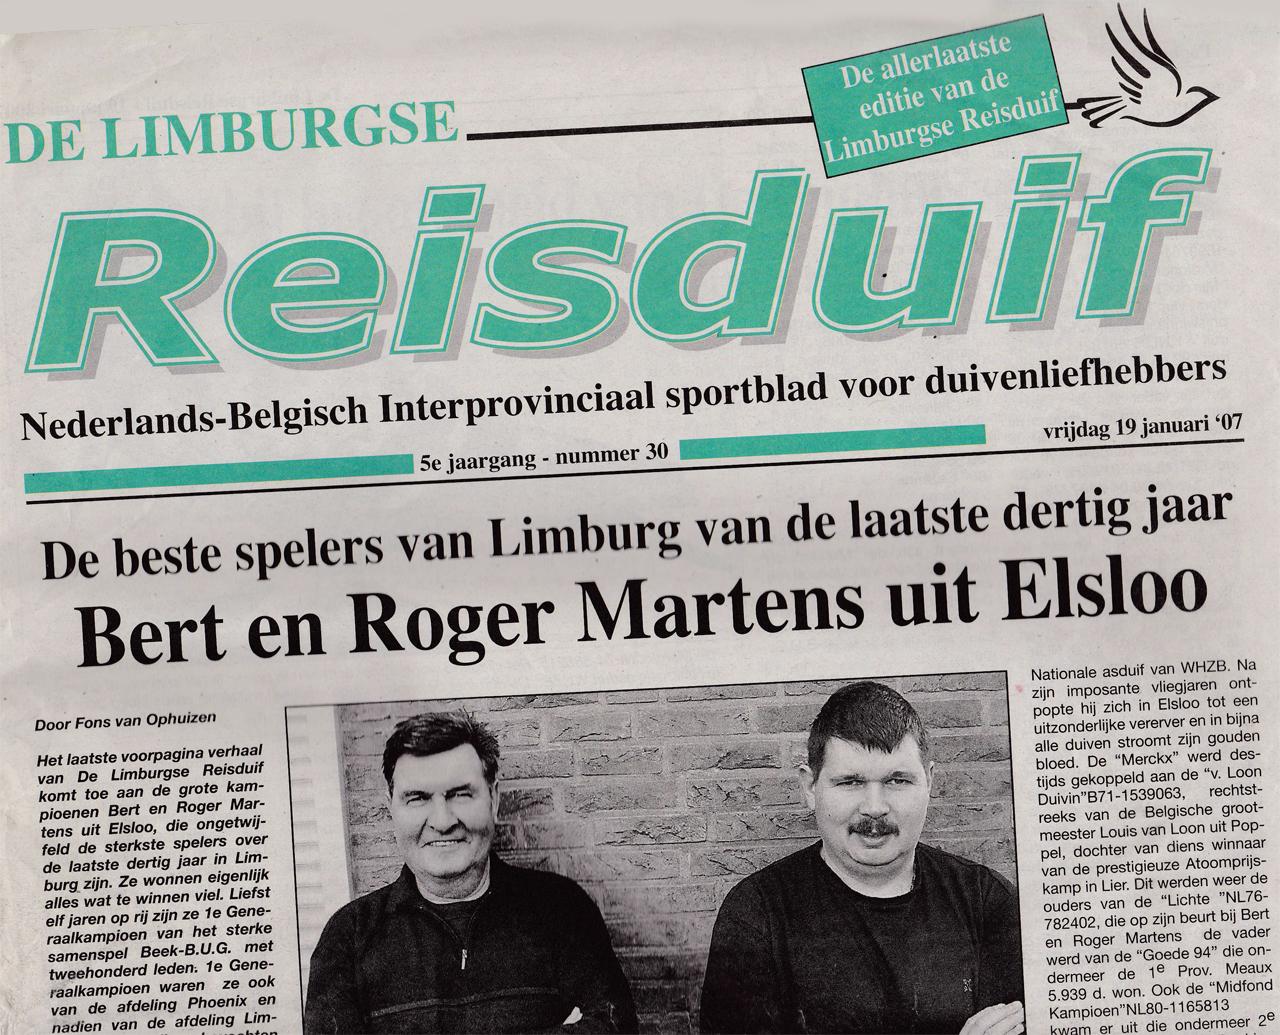 2007 - De Limburgse Reisduif